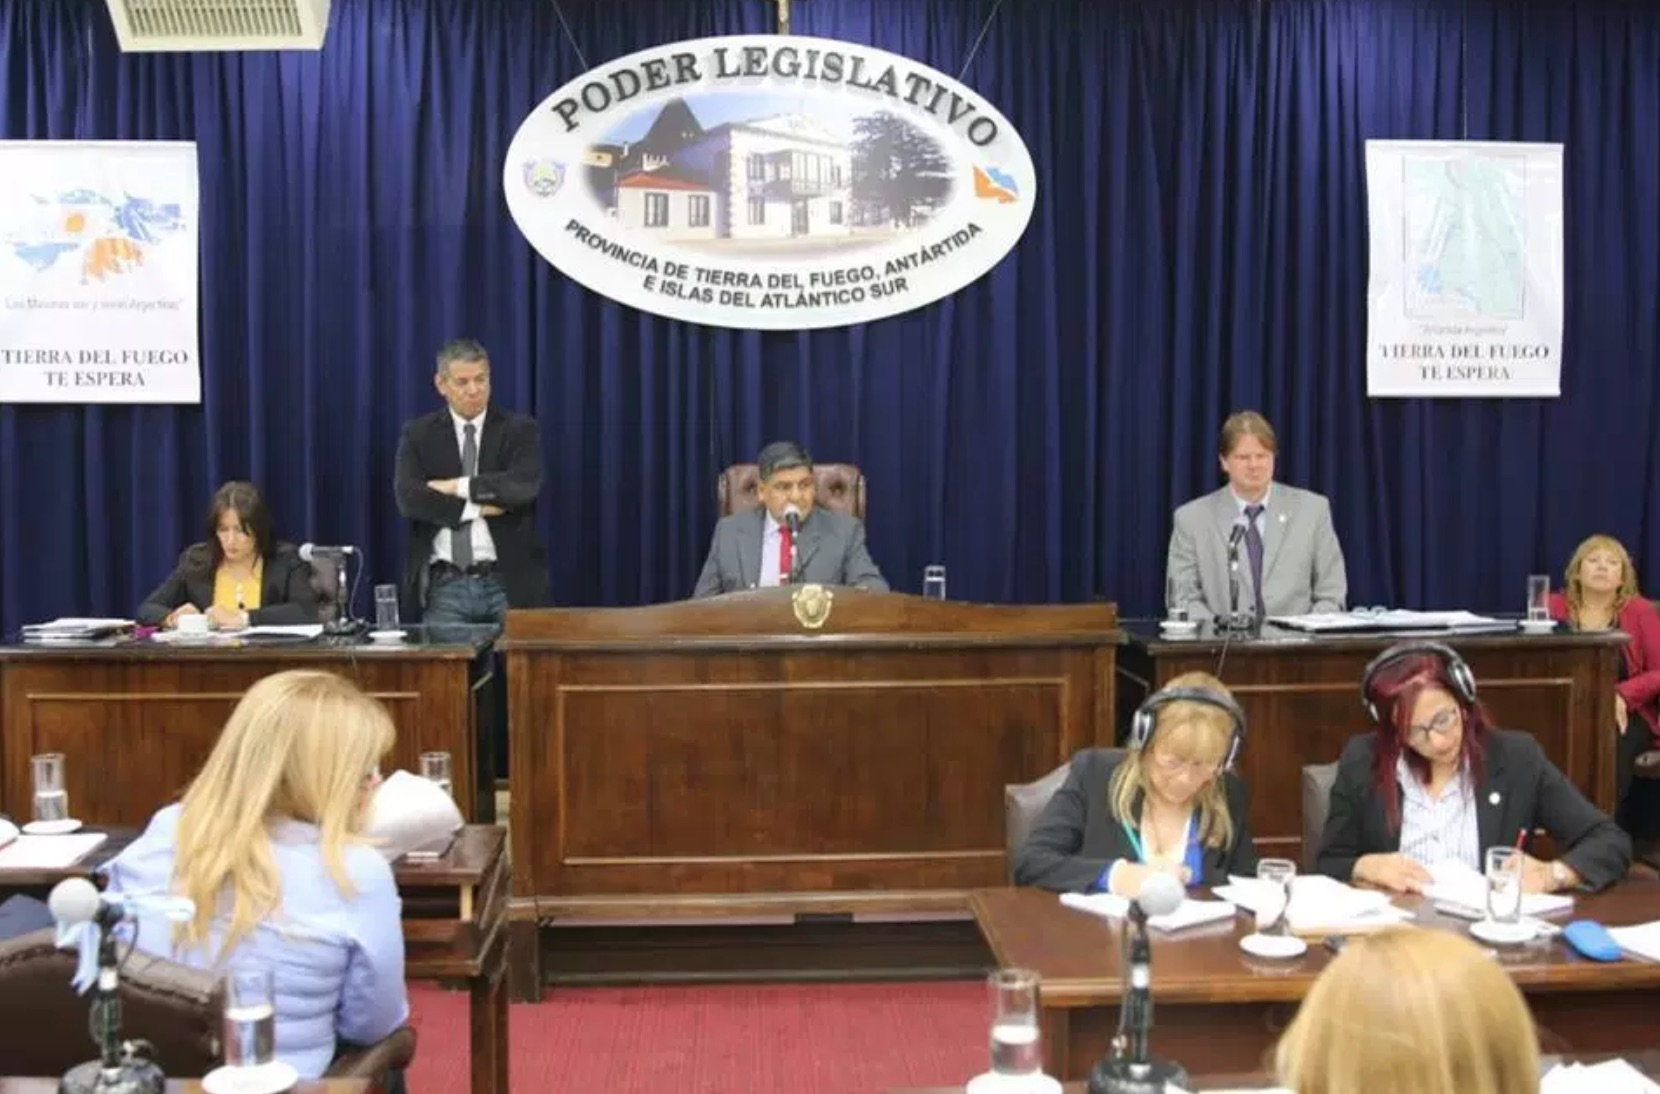 legisla sesion especial 11 abril